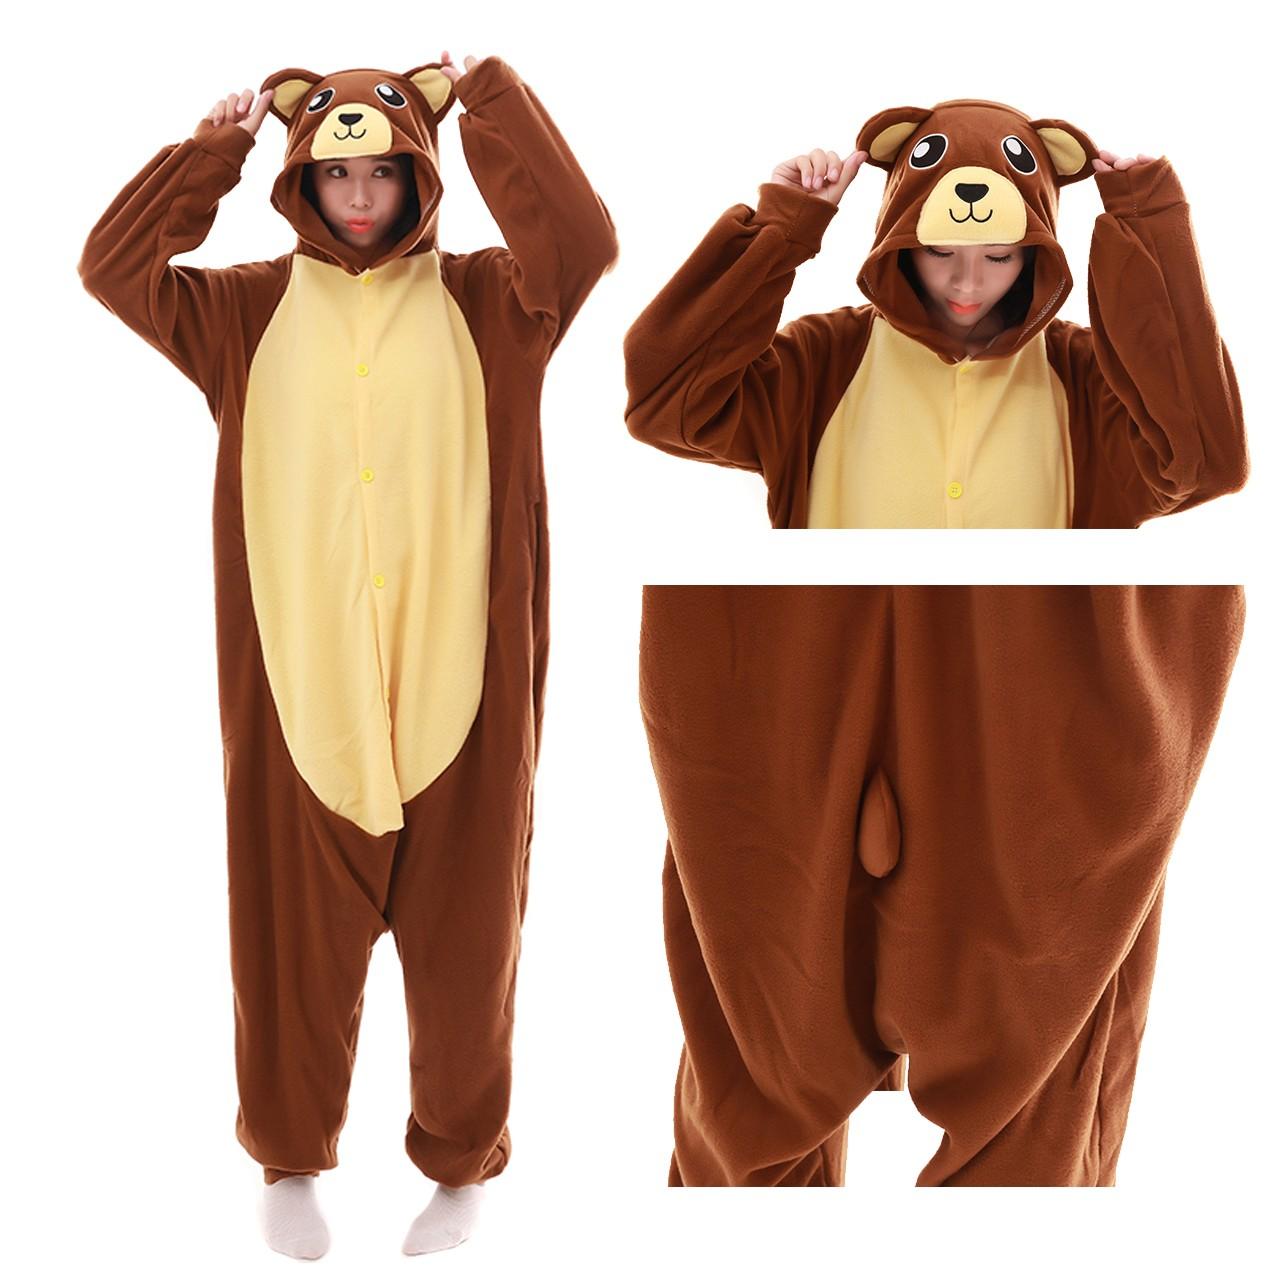 7420ce0bca Brown Bear Onesie Animal Kigurumi Pajama Women   Men Halloween Costumes